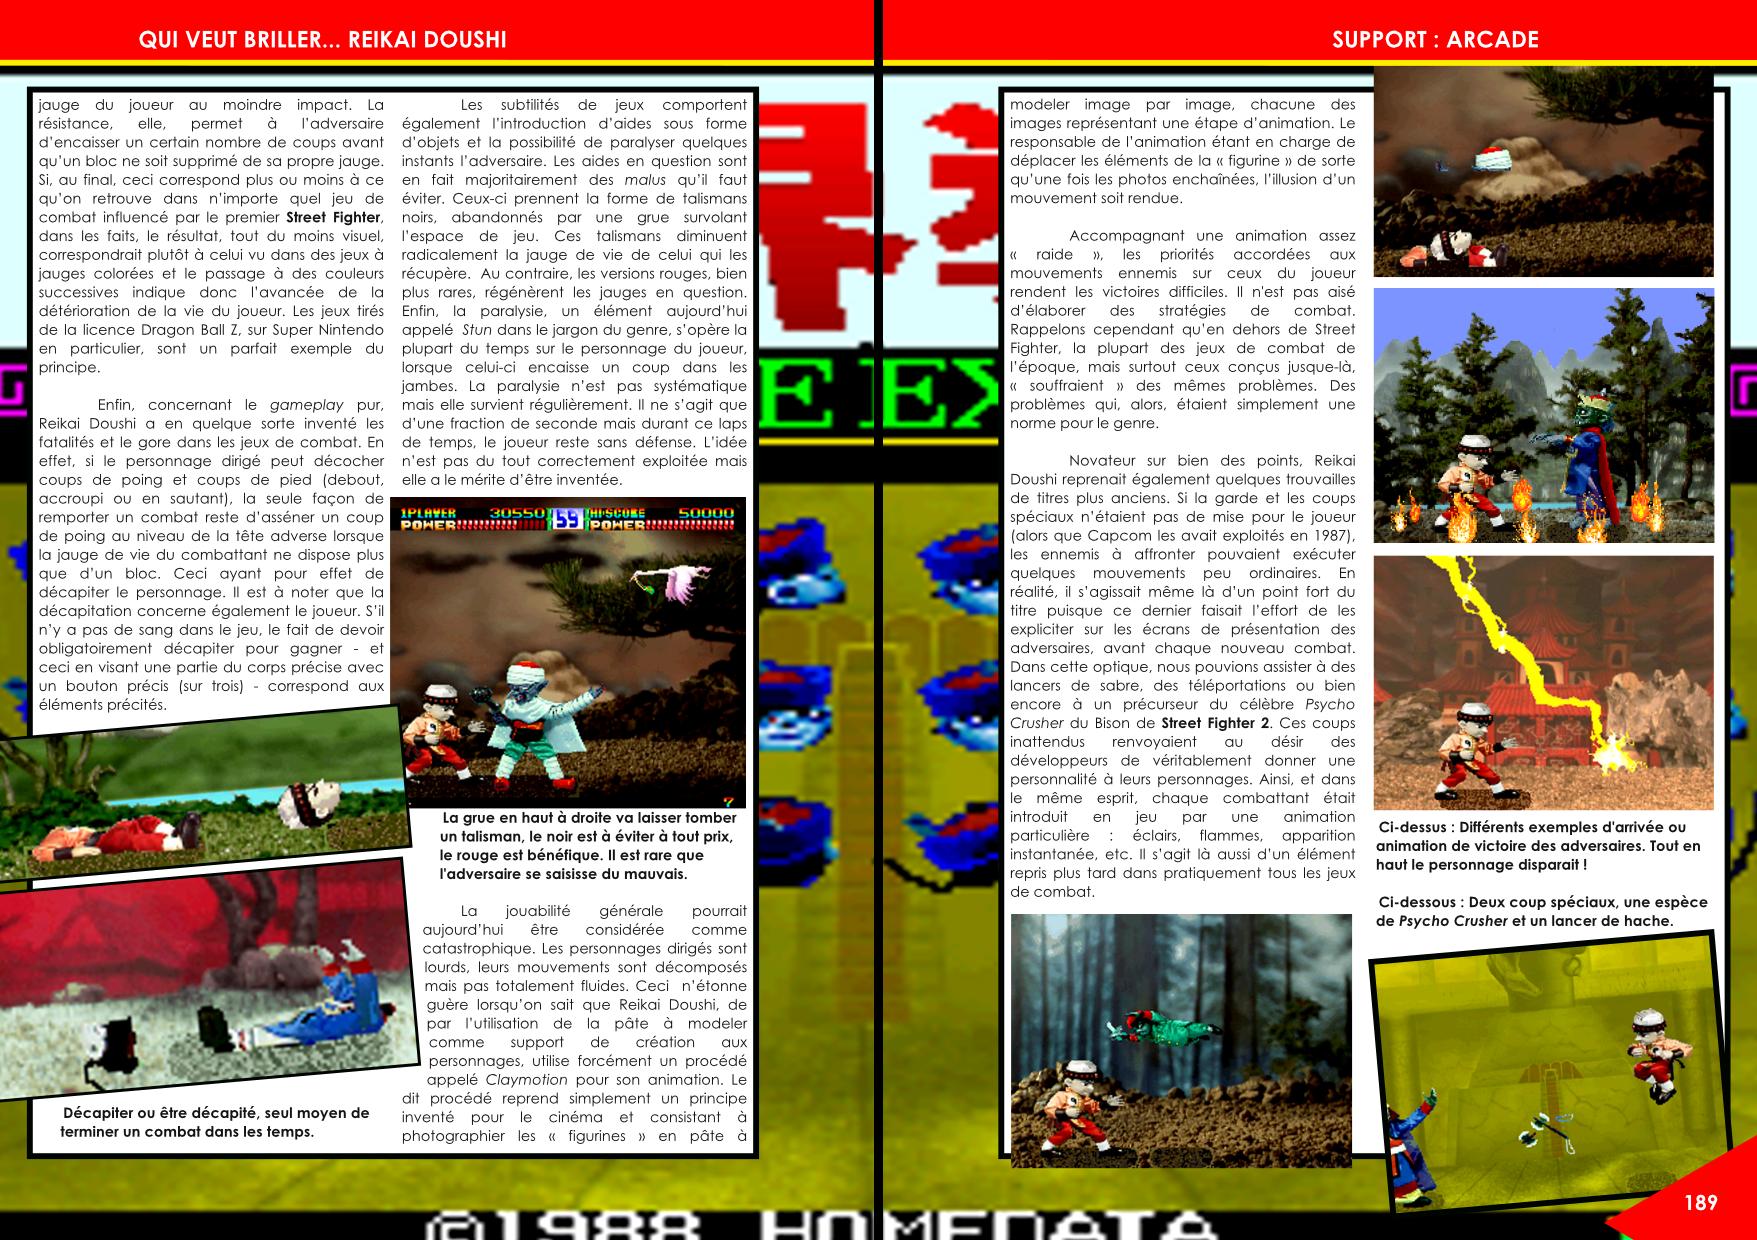 Reikai Doushi en arcade de Home Data article de Côté Gamers